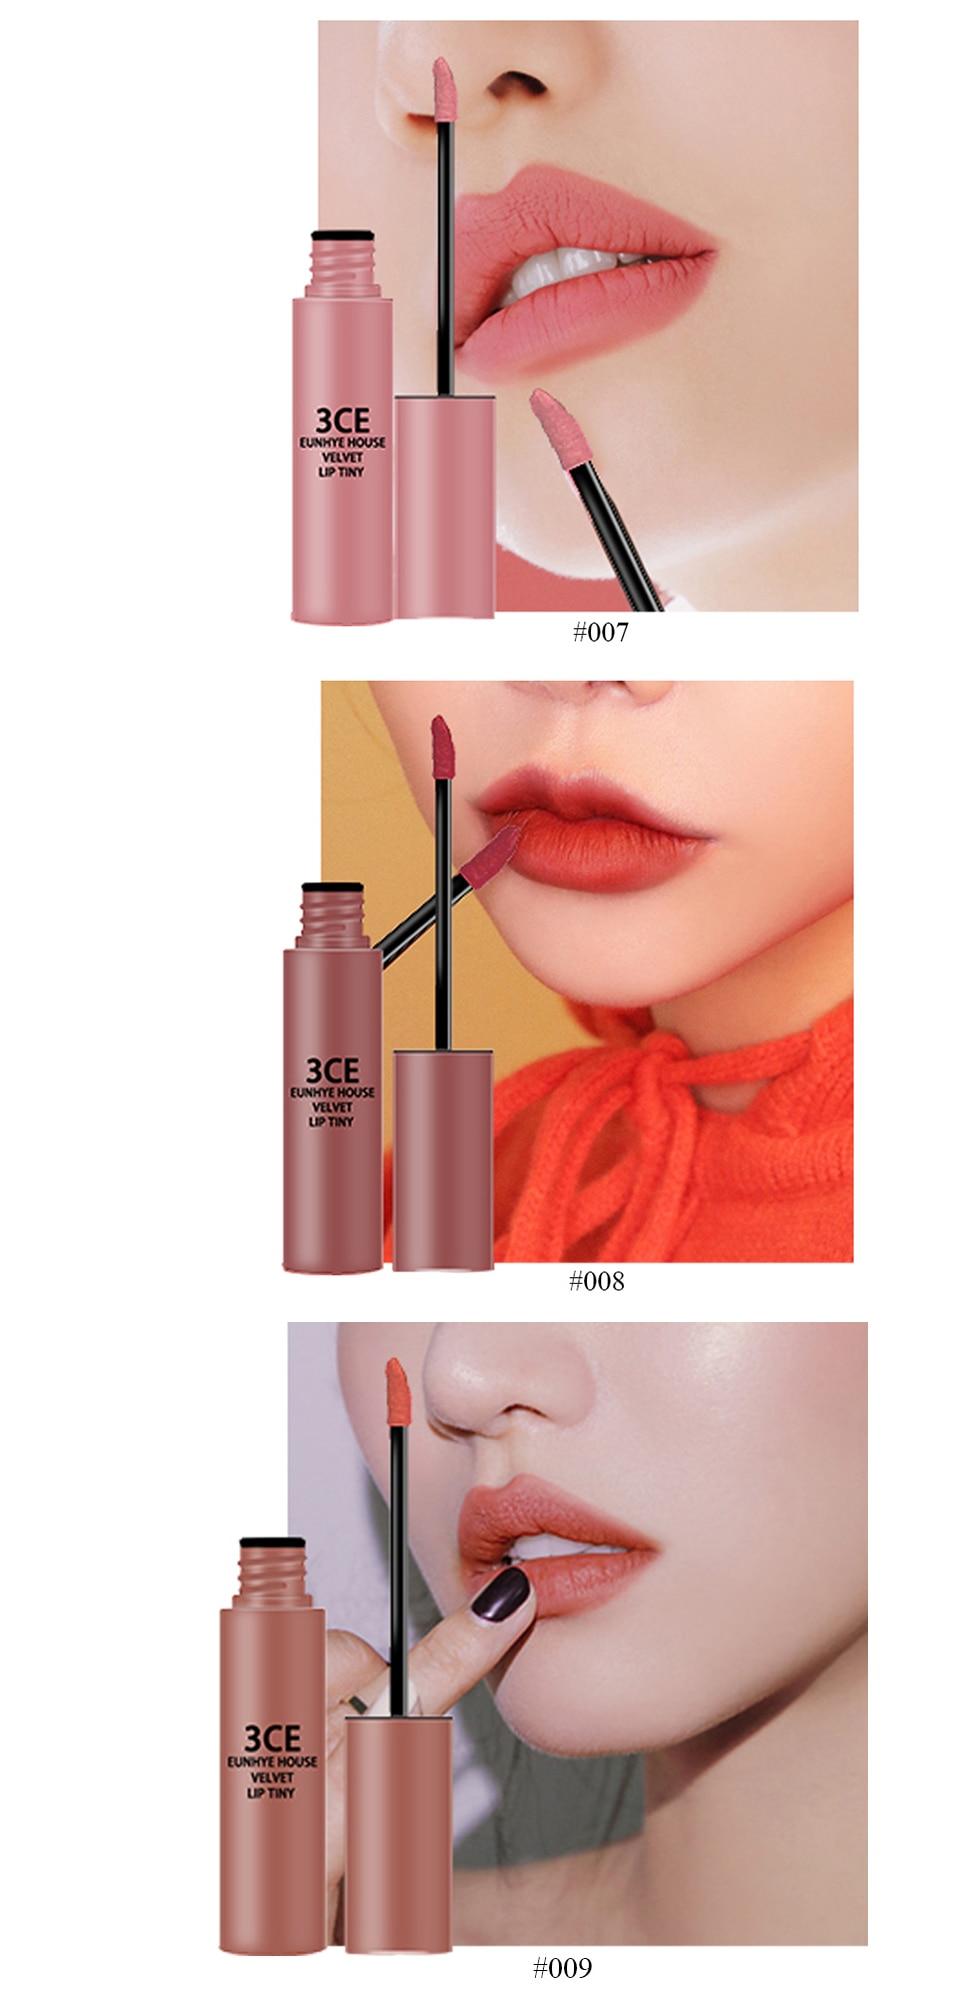 3CE Eunhye House Brand New Lip Cosmetics 3 colors Lip glaze Moisturizer Long-lasting Lip Makeup for common 15